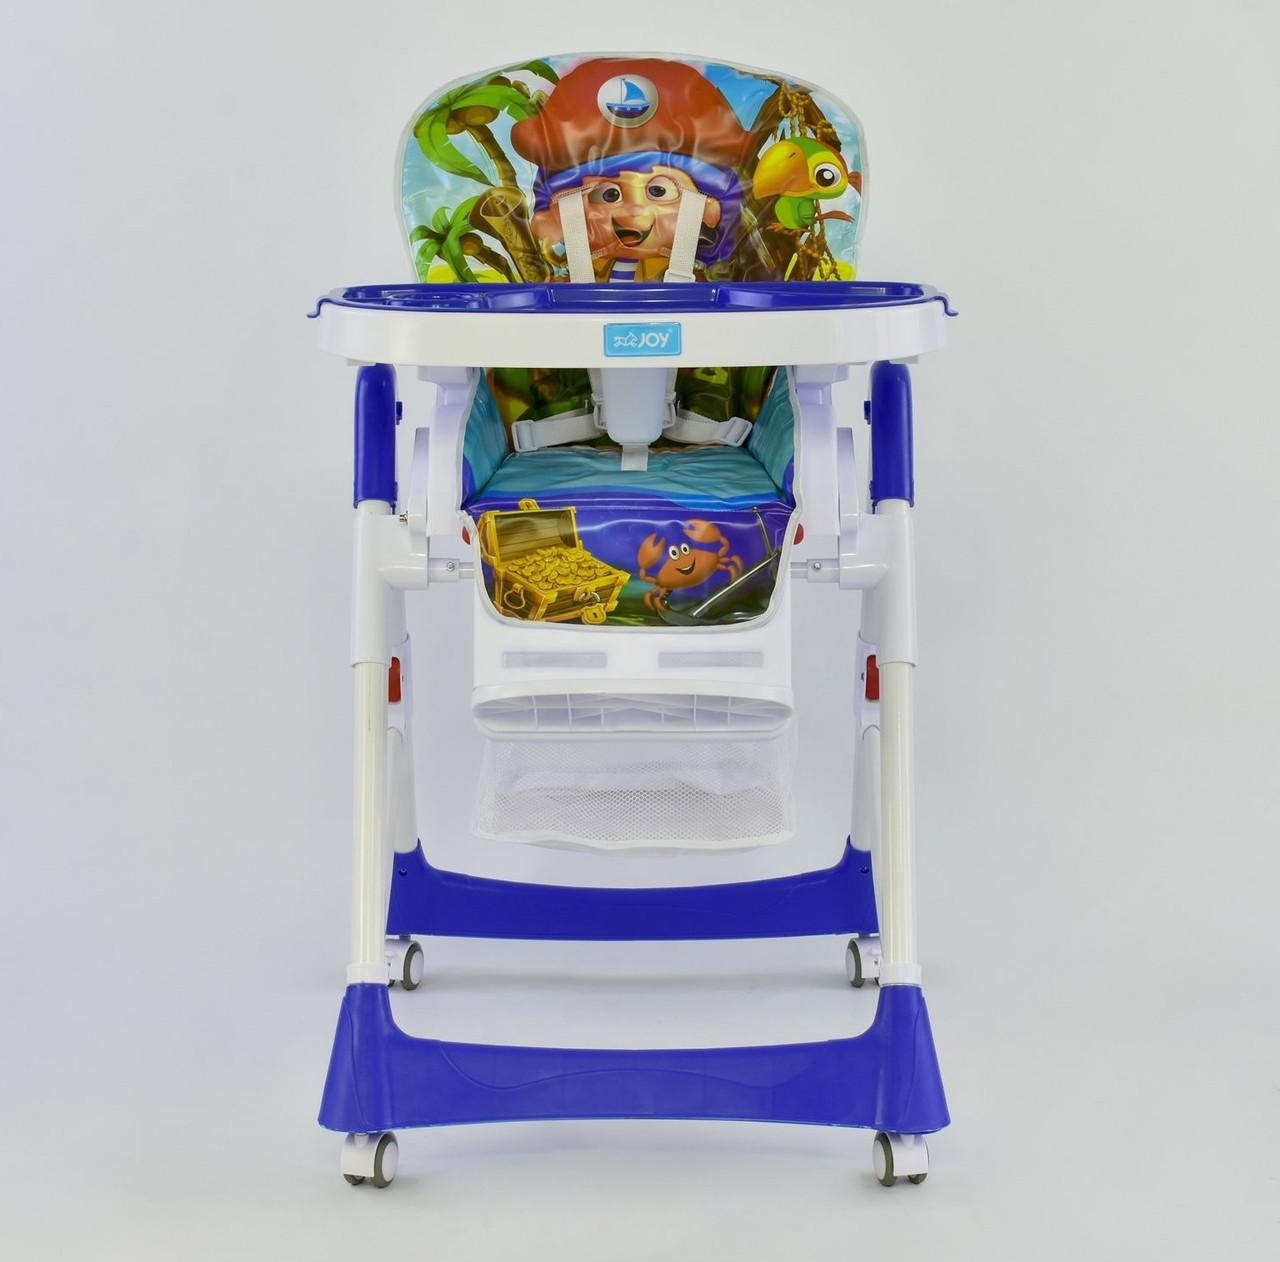 Joy Стульчик для кормления Joy J 1750 Blue (J 1750)